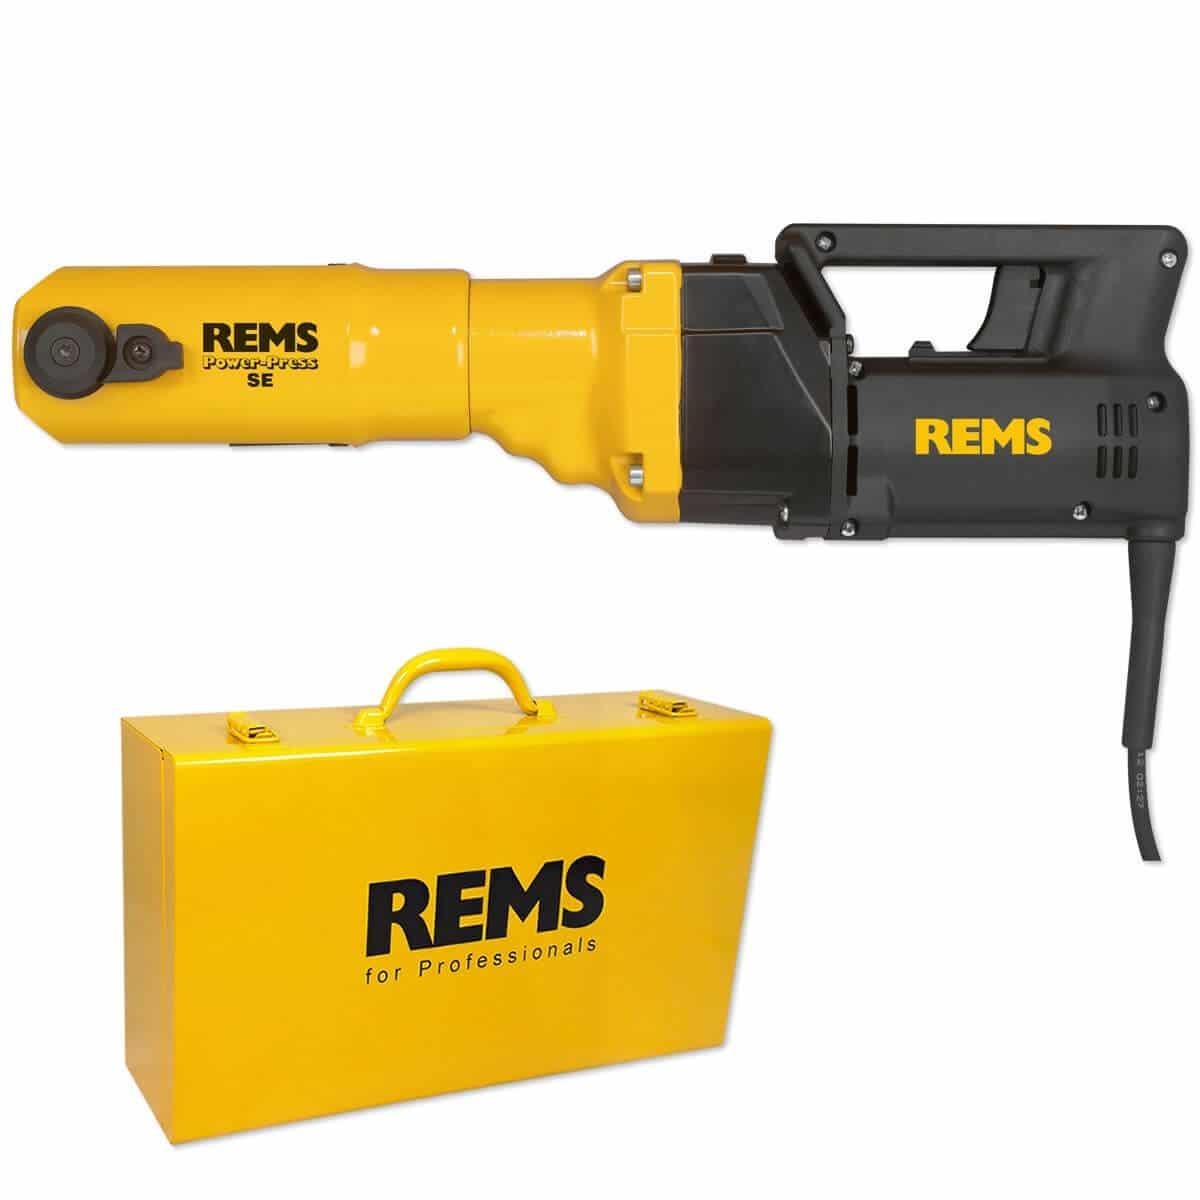 Torupress REMS Power-Press SE